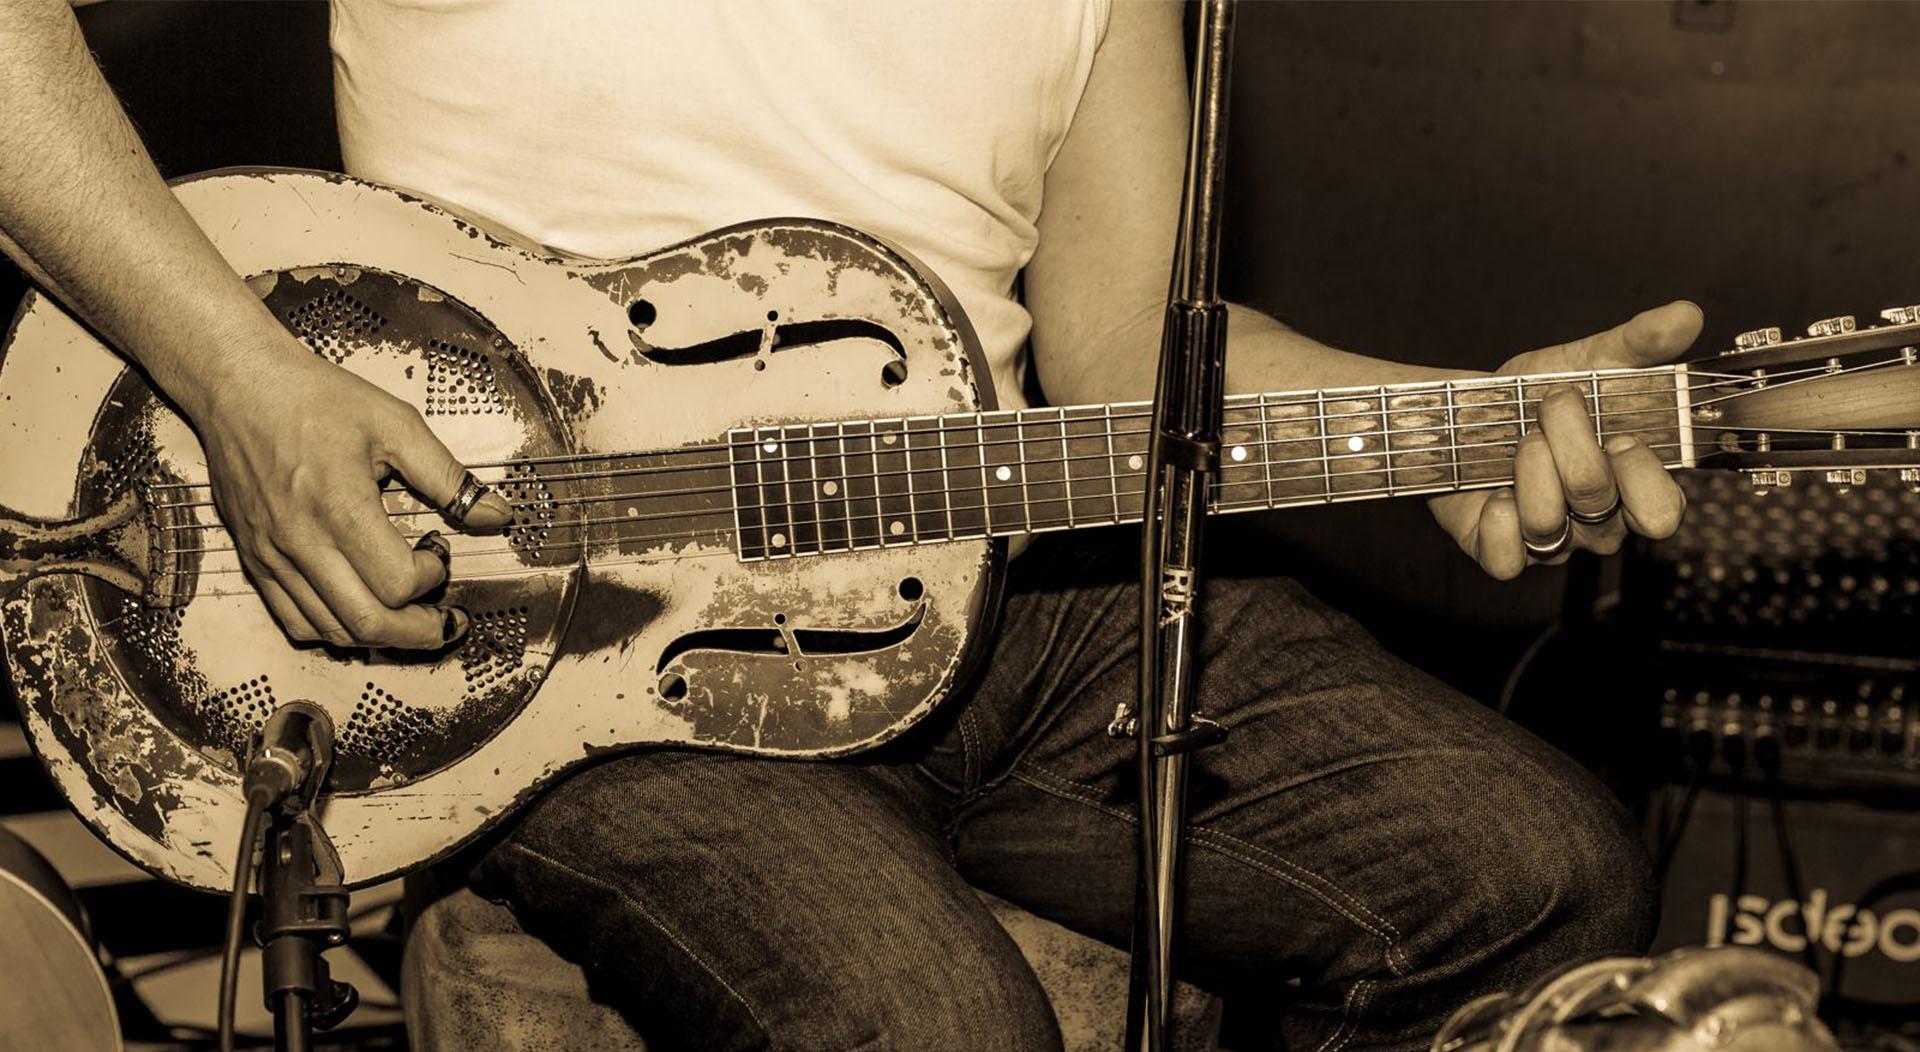 bone_tee_bonetee_blues_concert_guitar_tonsor_cie_barbershop